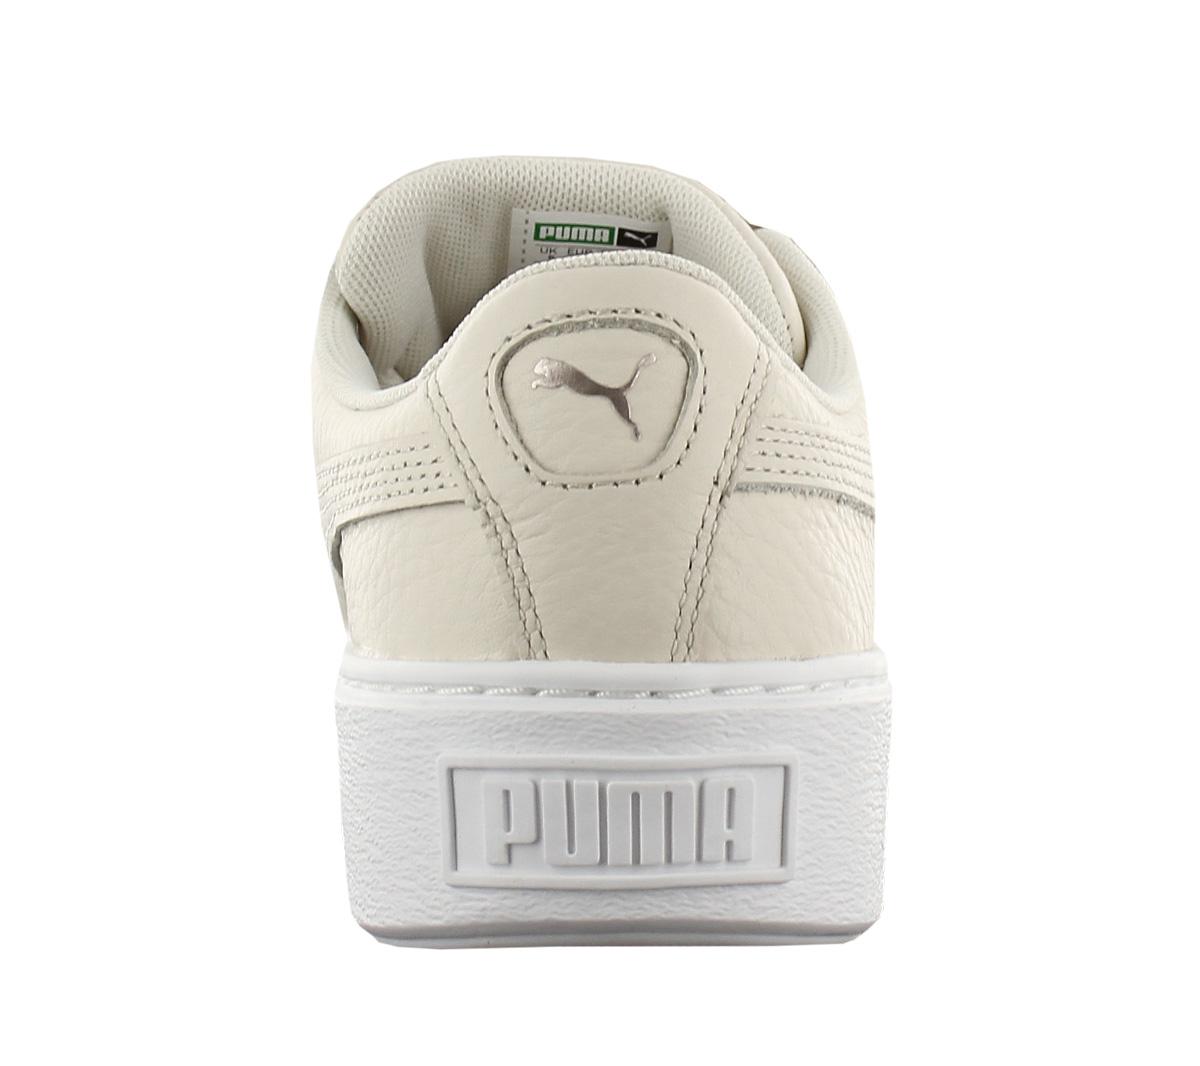 25a1f52c5e9 Puma Platform Kiss Leather Women s Sneakers Shoe Basket 366460-02